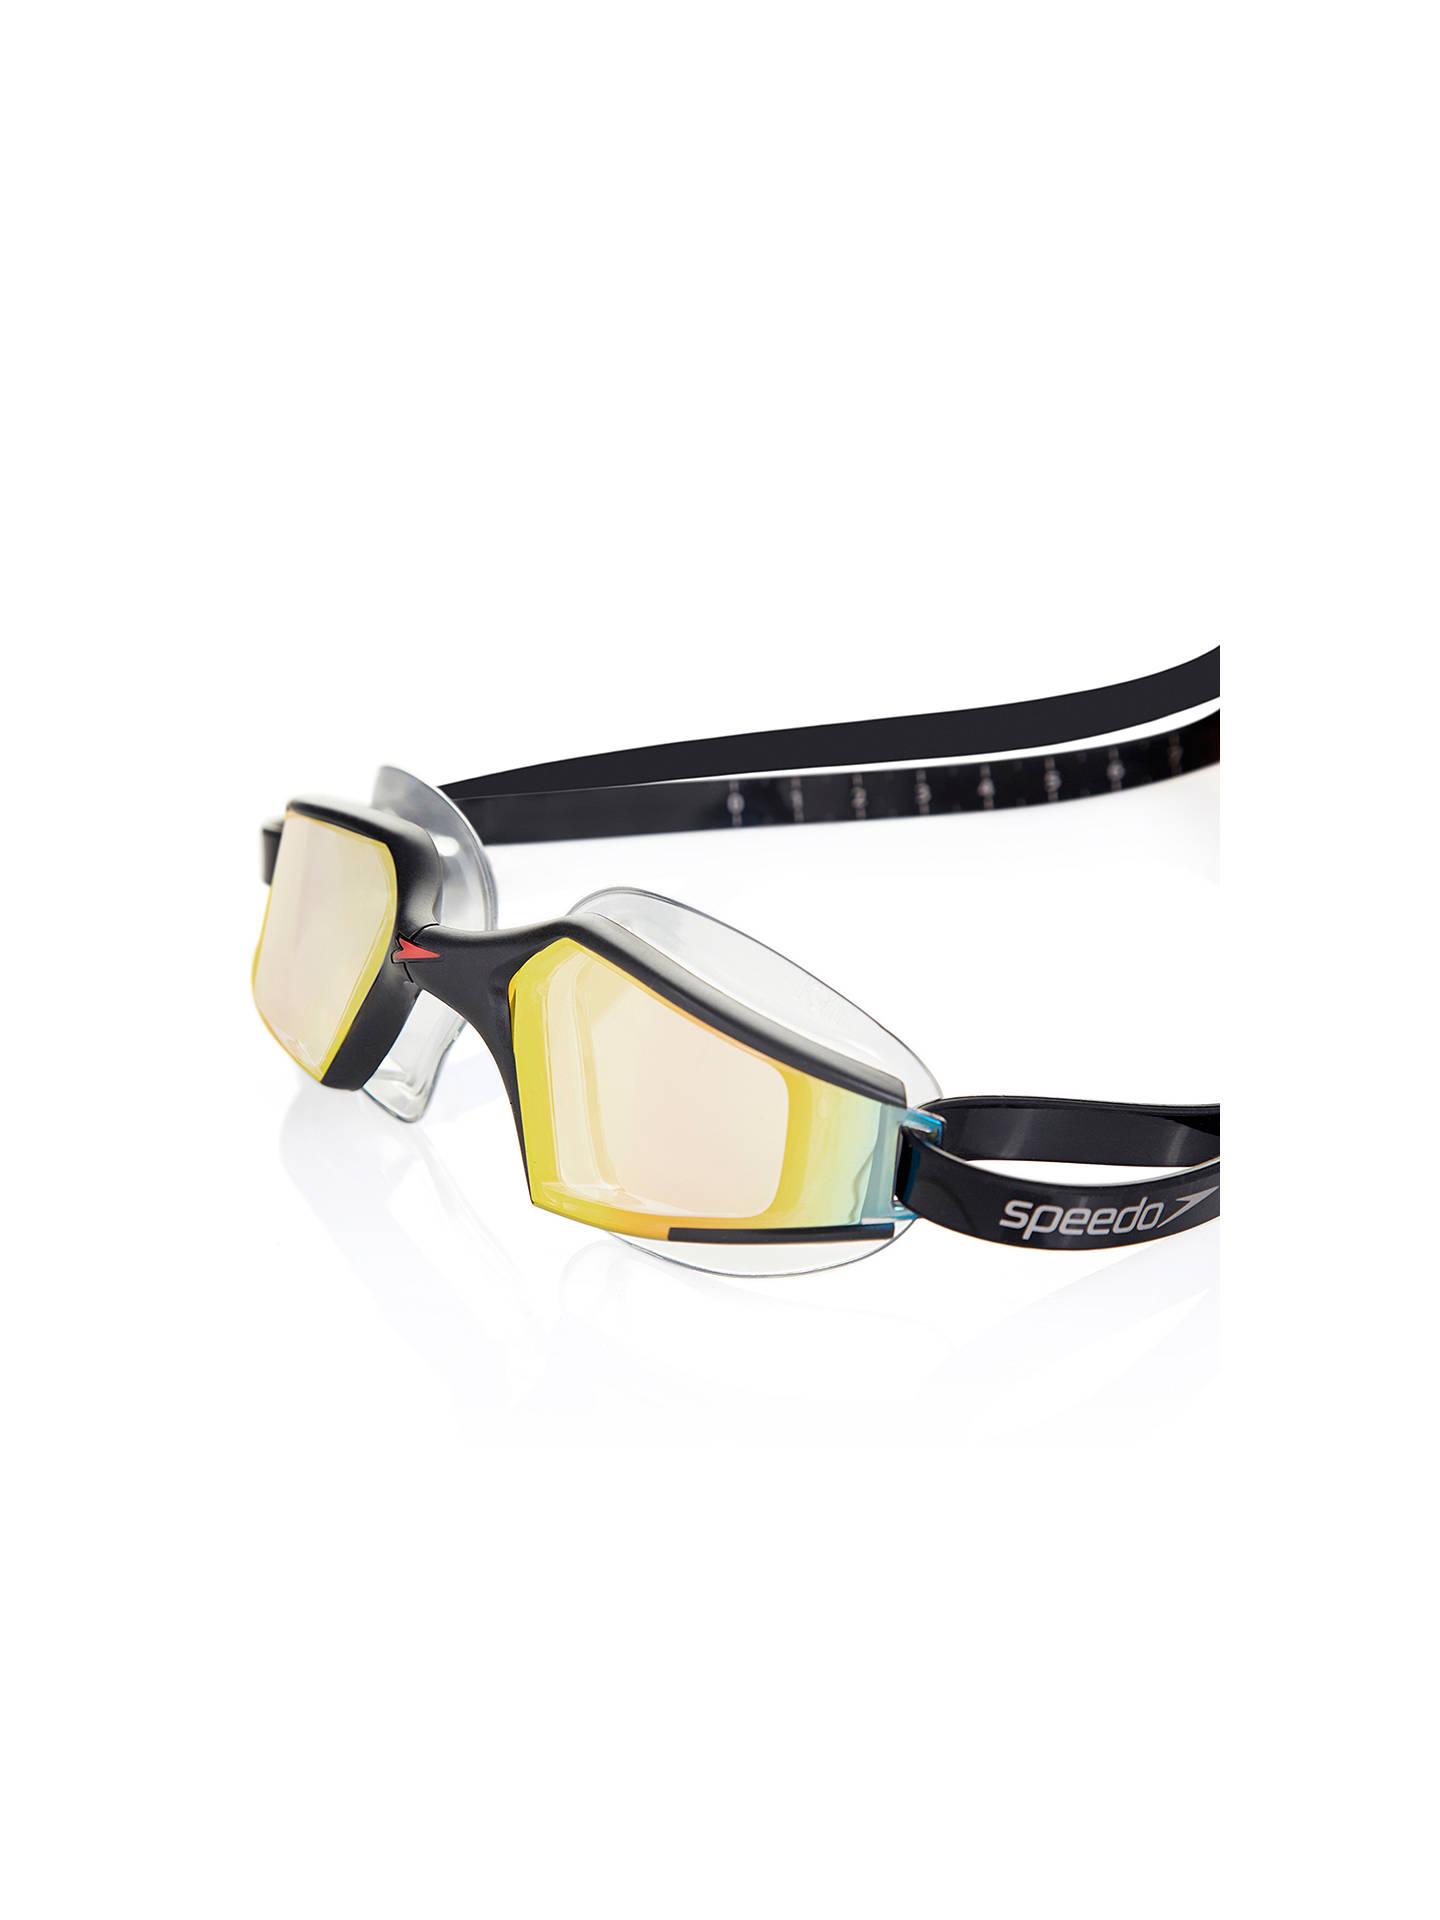 BuySpeedo Aquapulse Max Mirror 2 IQfit Swimming Goggle ea3f05e246